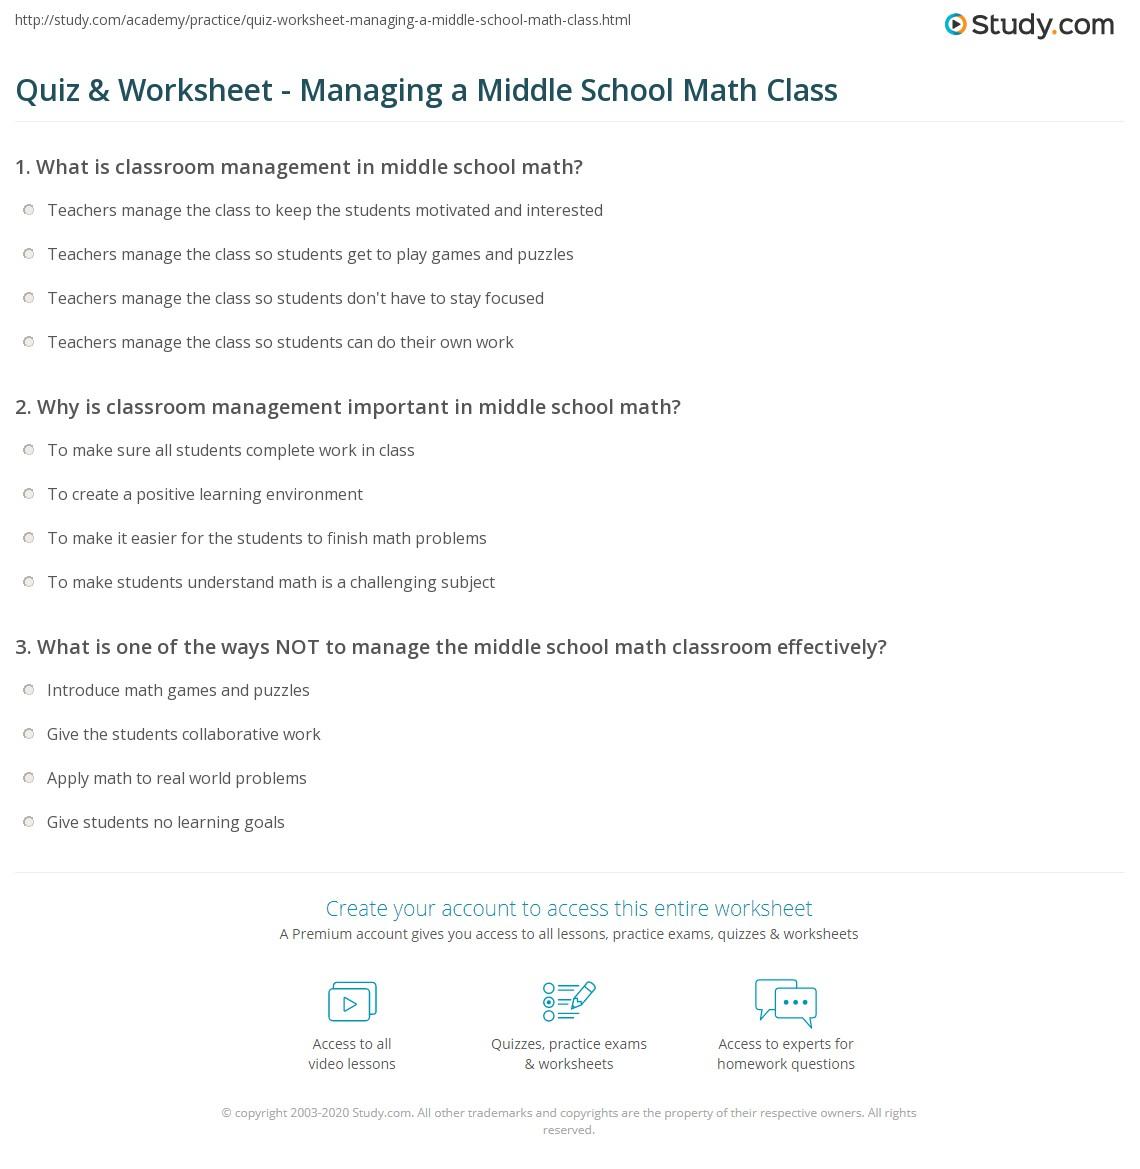 Quiz & Worksheet - Managing a Middle School Math Class   Study.com